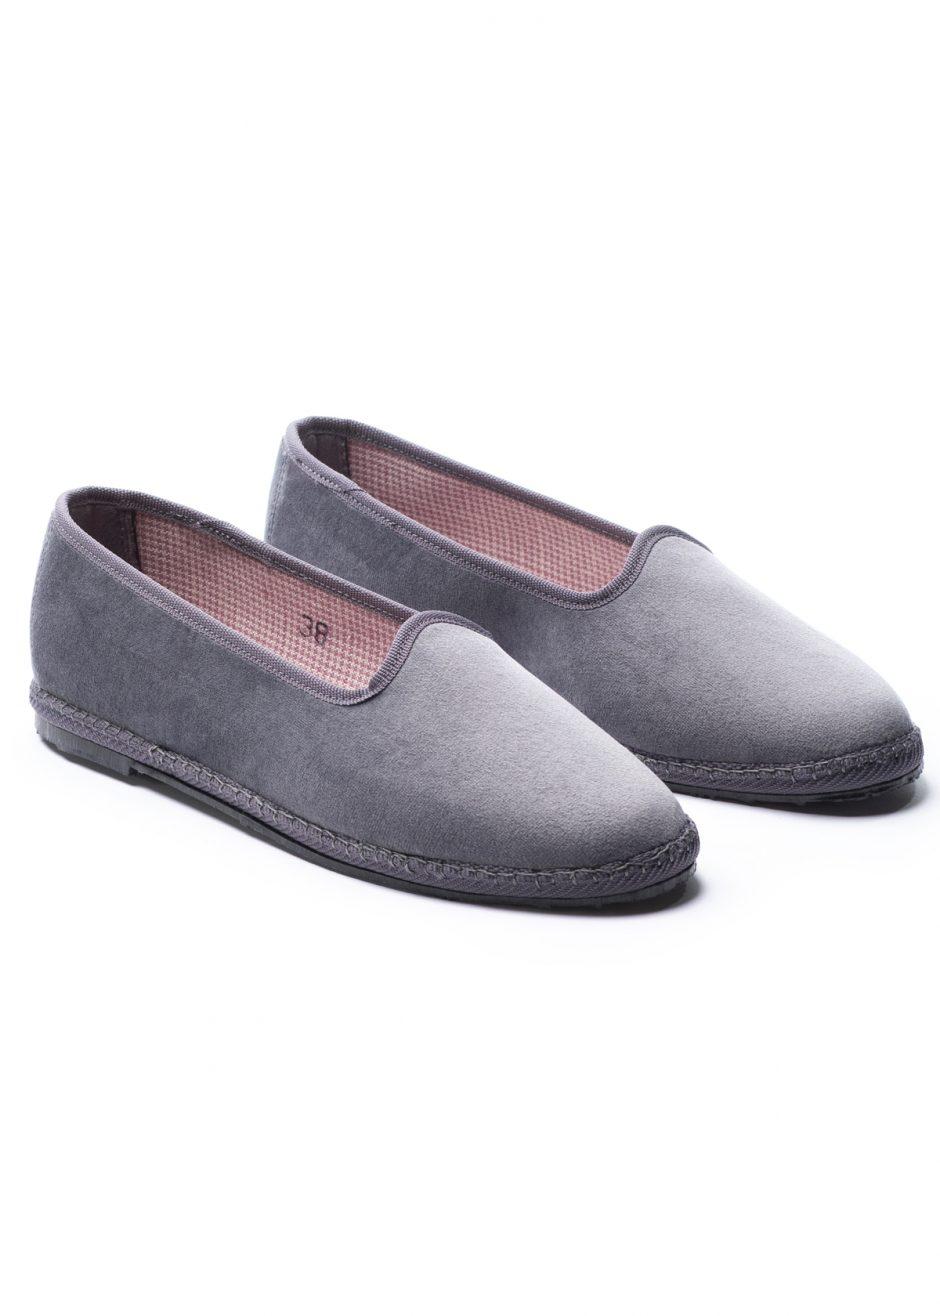 Rialto – furlana grey velvet